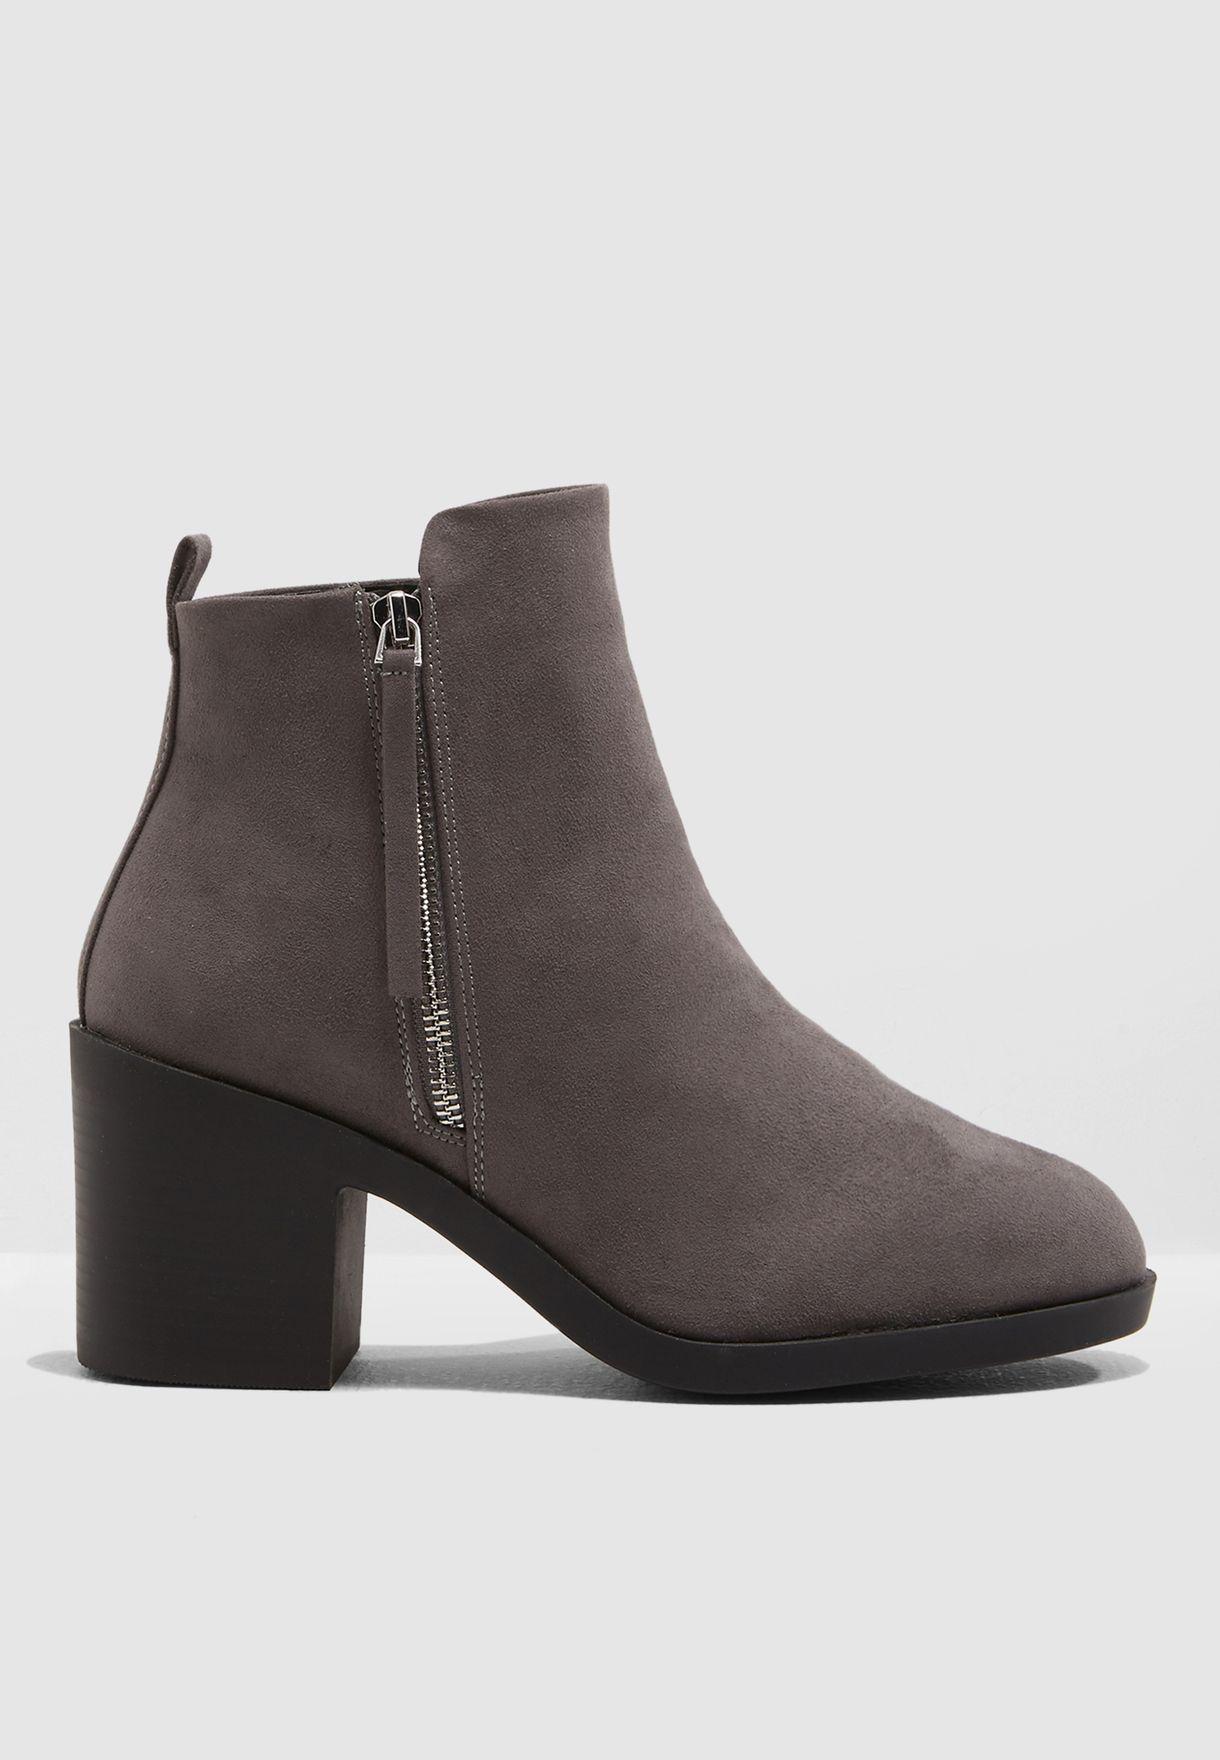 d9ddc7b1ae7 Shop Topshop grey Brittney Unit Boot 42B07PGRY for Women in UAE ...